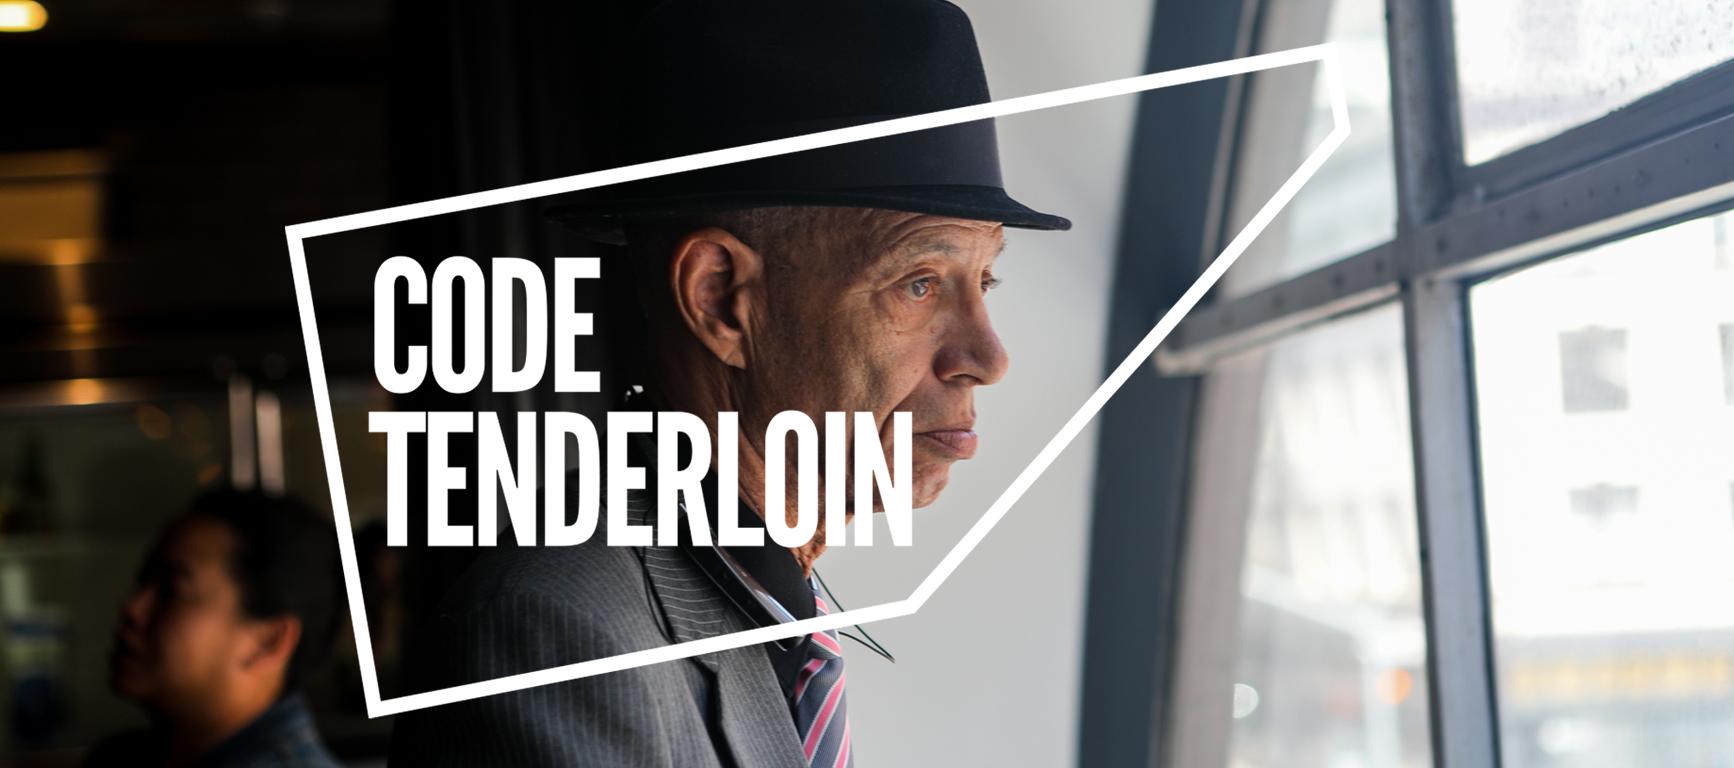 Code Tenderloin Rebrand